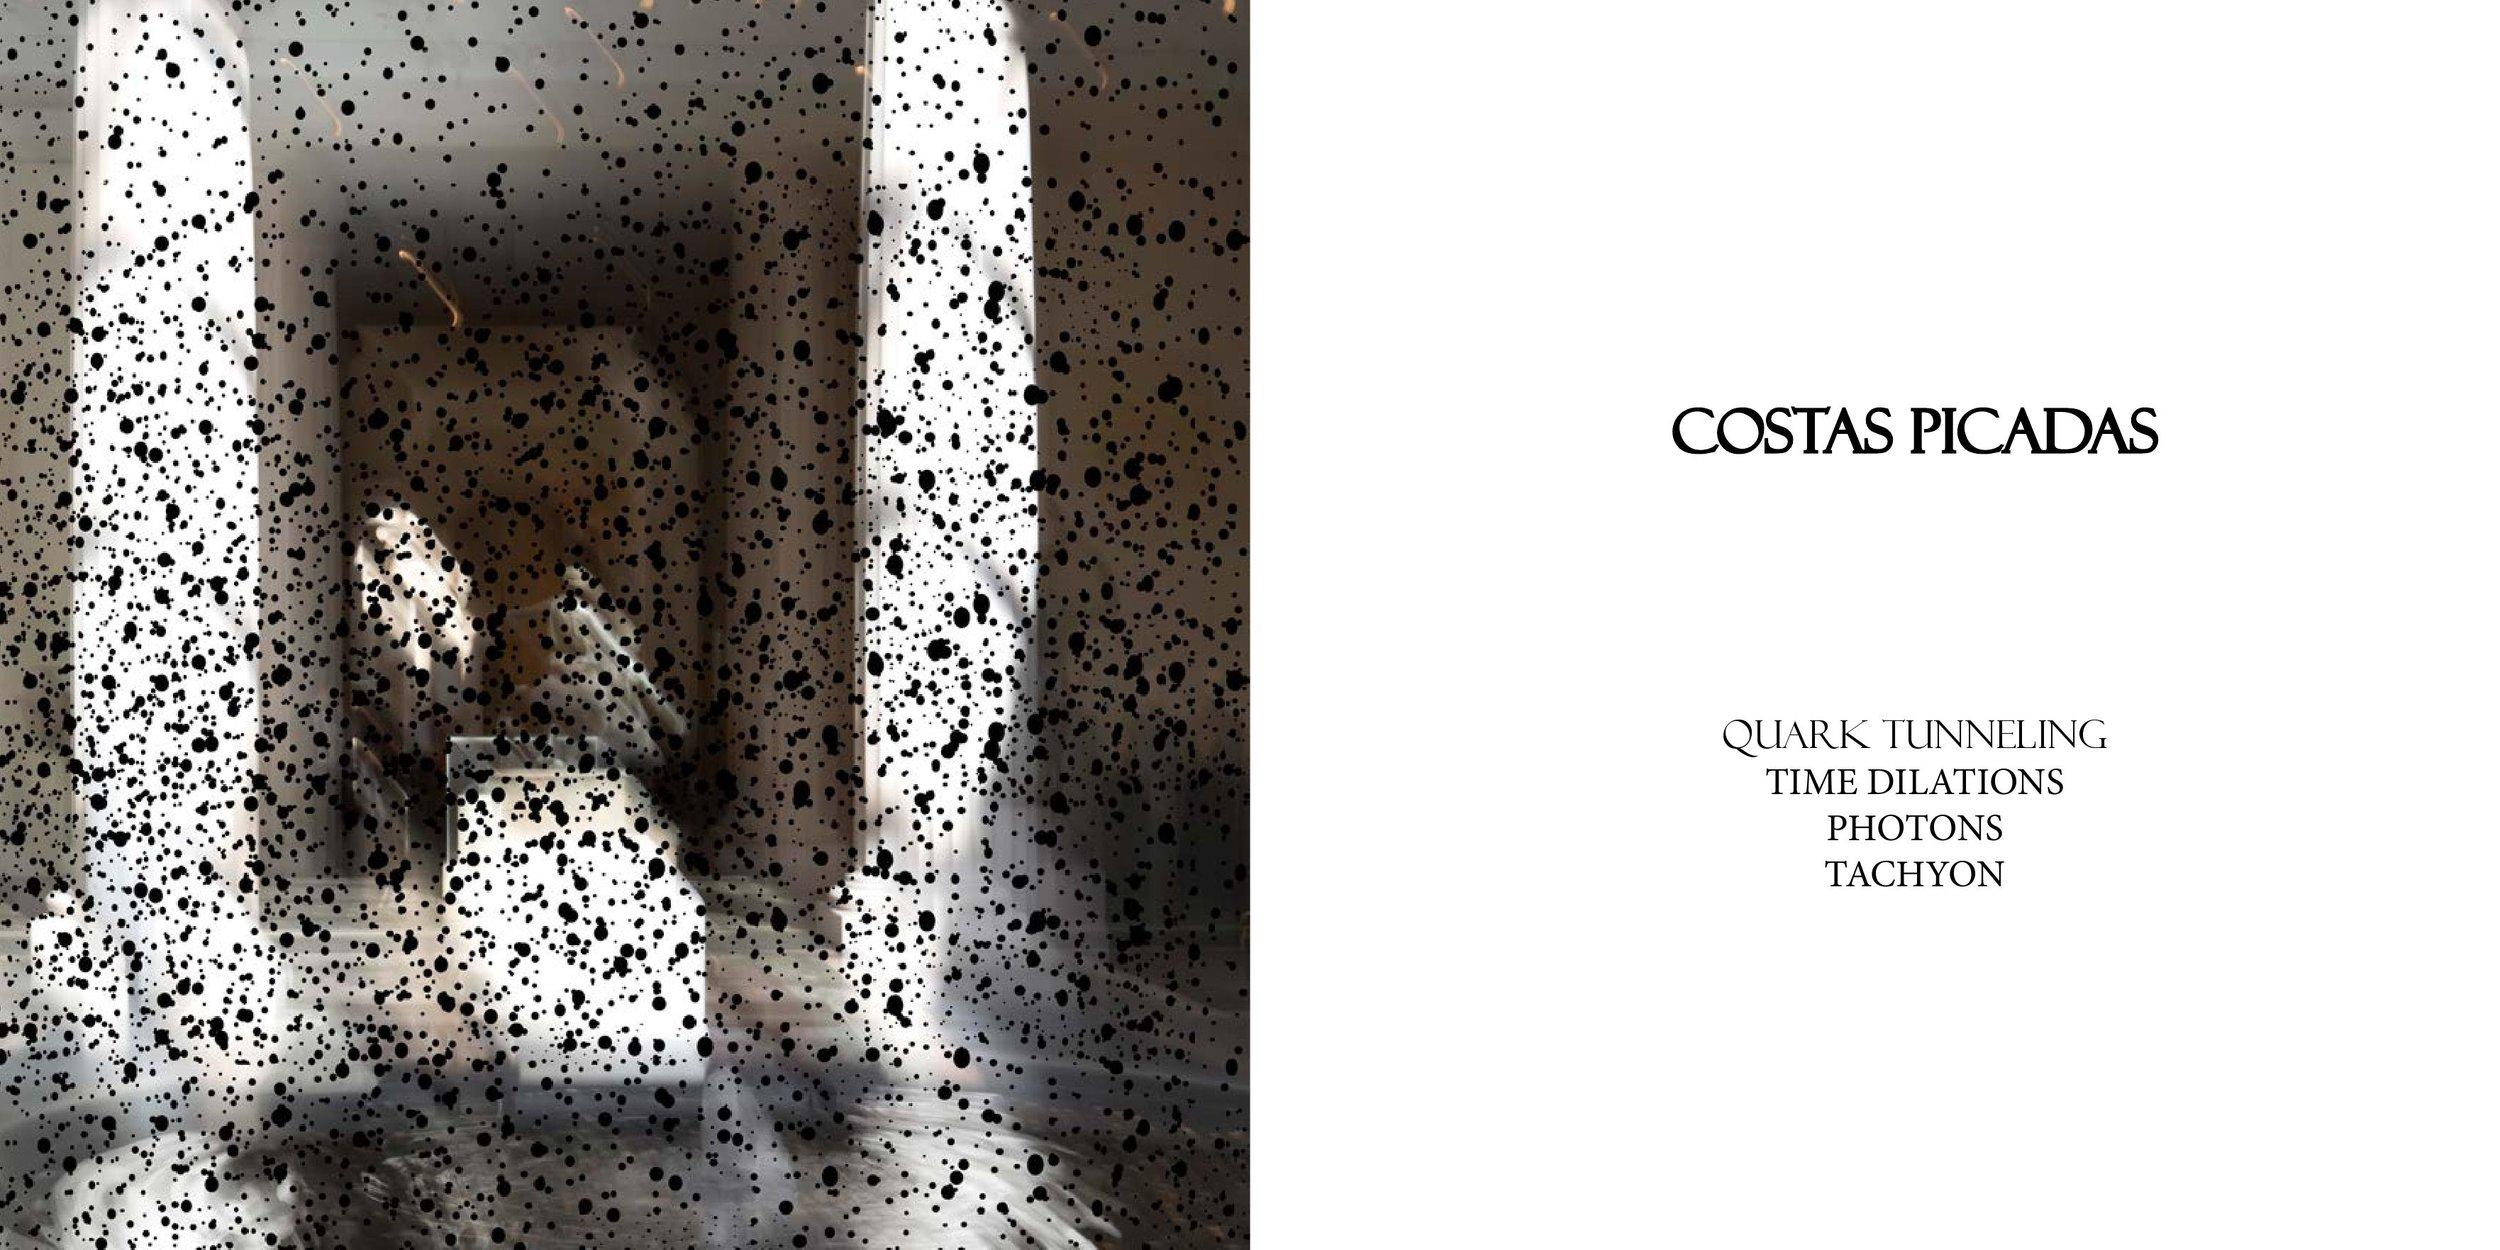 COSTAS PICADAS - QUARK TUNNELING_000003.jpg